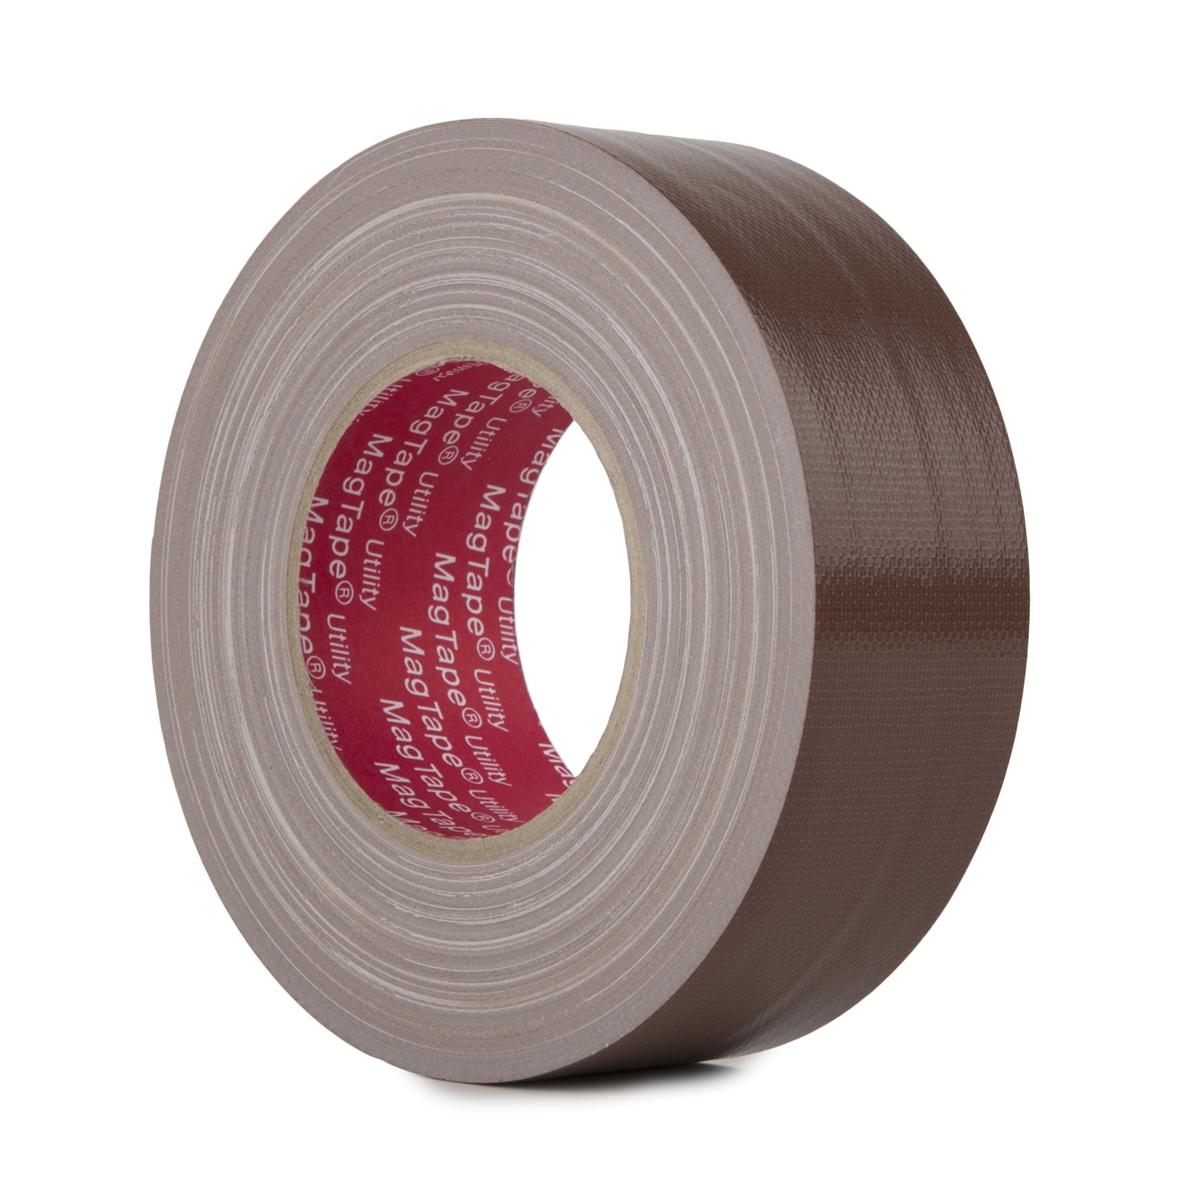 MagTape Utility gaffa tape 50mm x 50m bruin